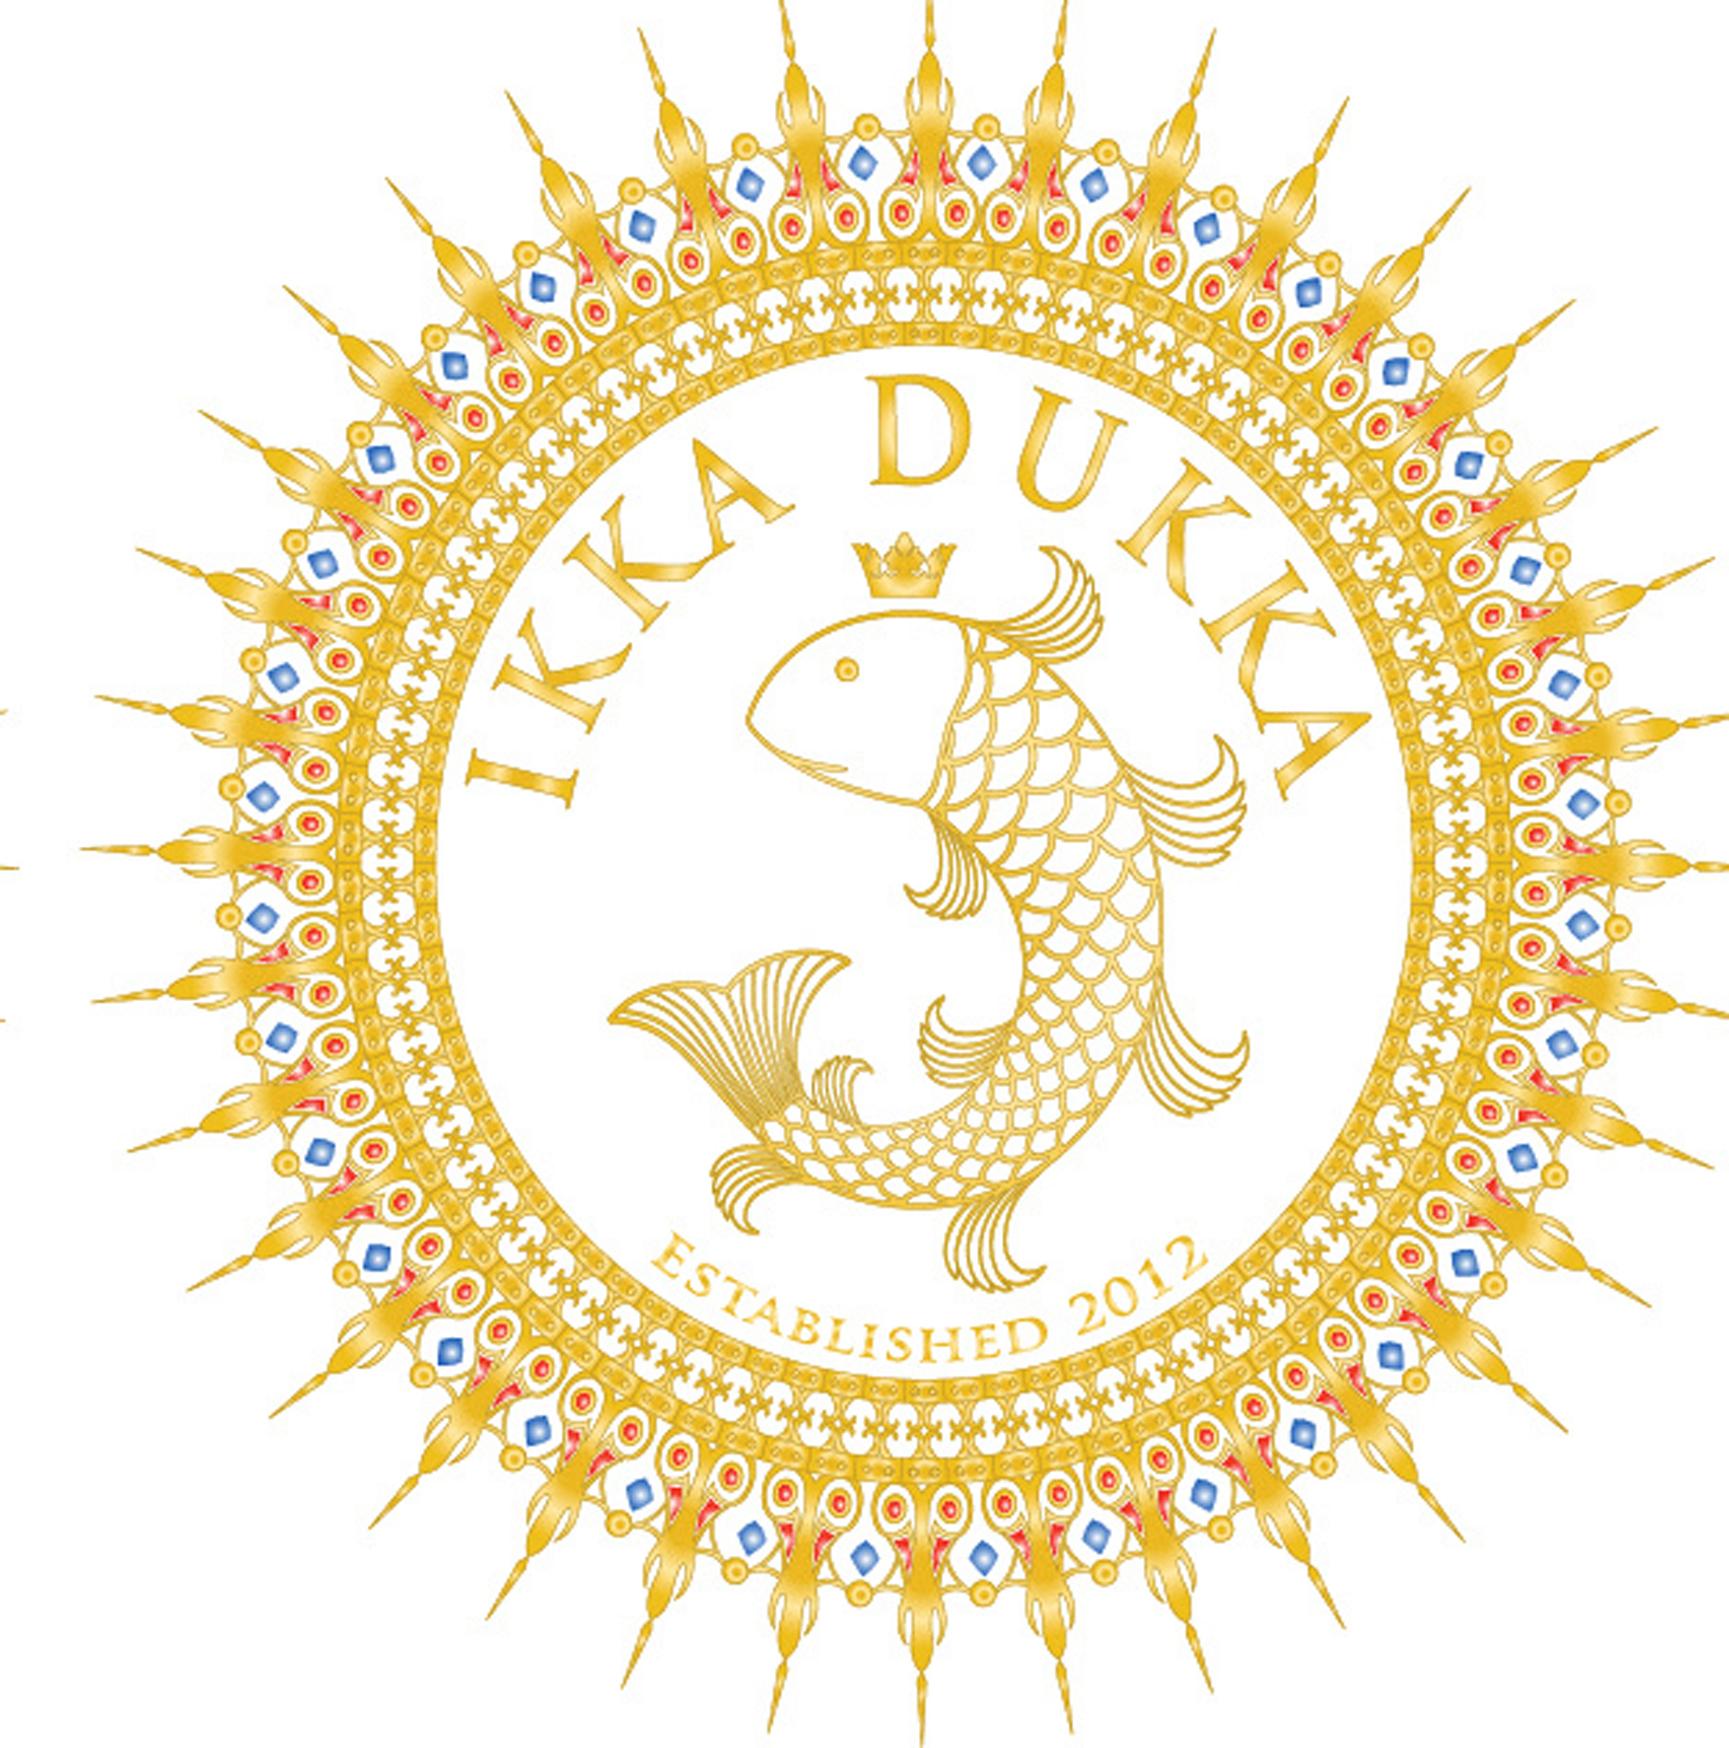 Ikka Dukka Studio Private Limited Job Openings